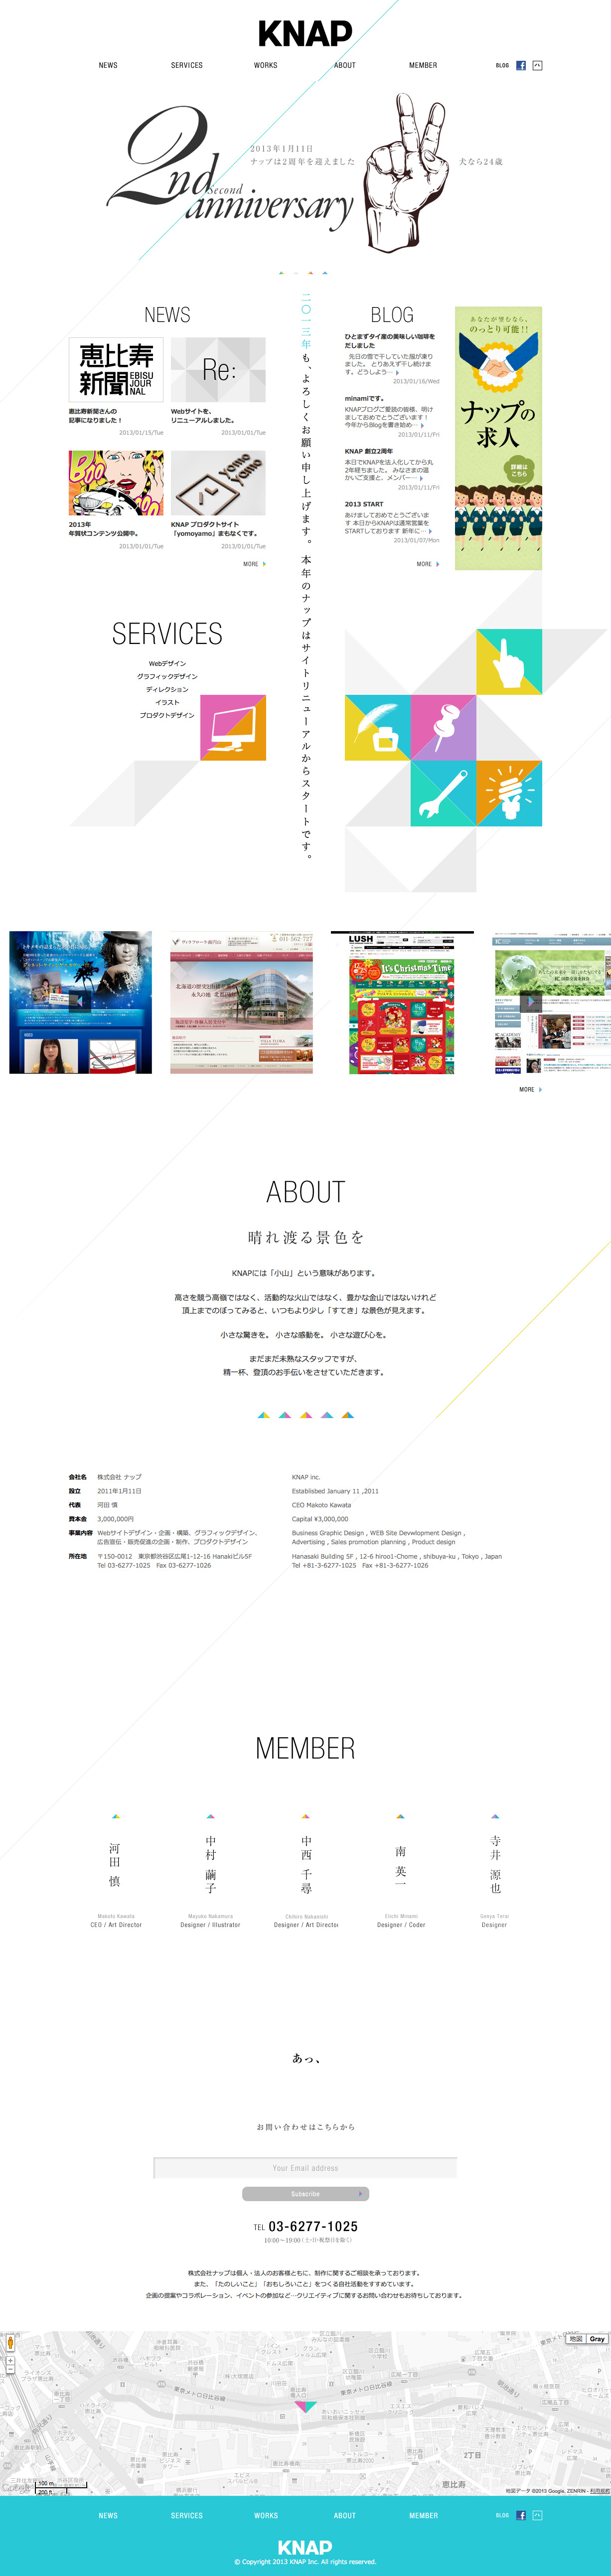 KNAP 株式会社ナップ | Webサイト・グラフィックデザイン・広告・イラスト制作